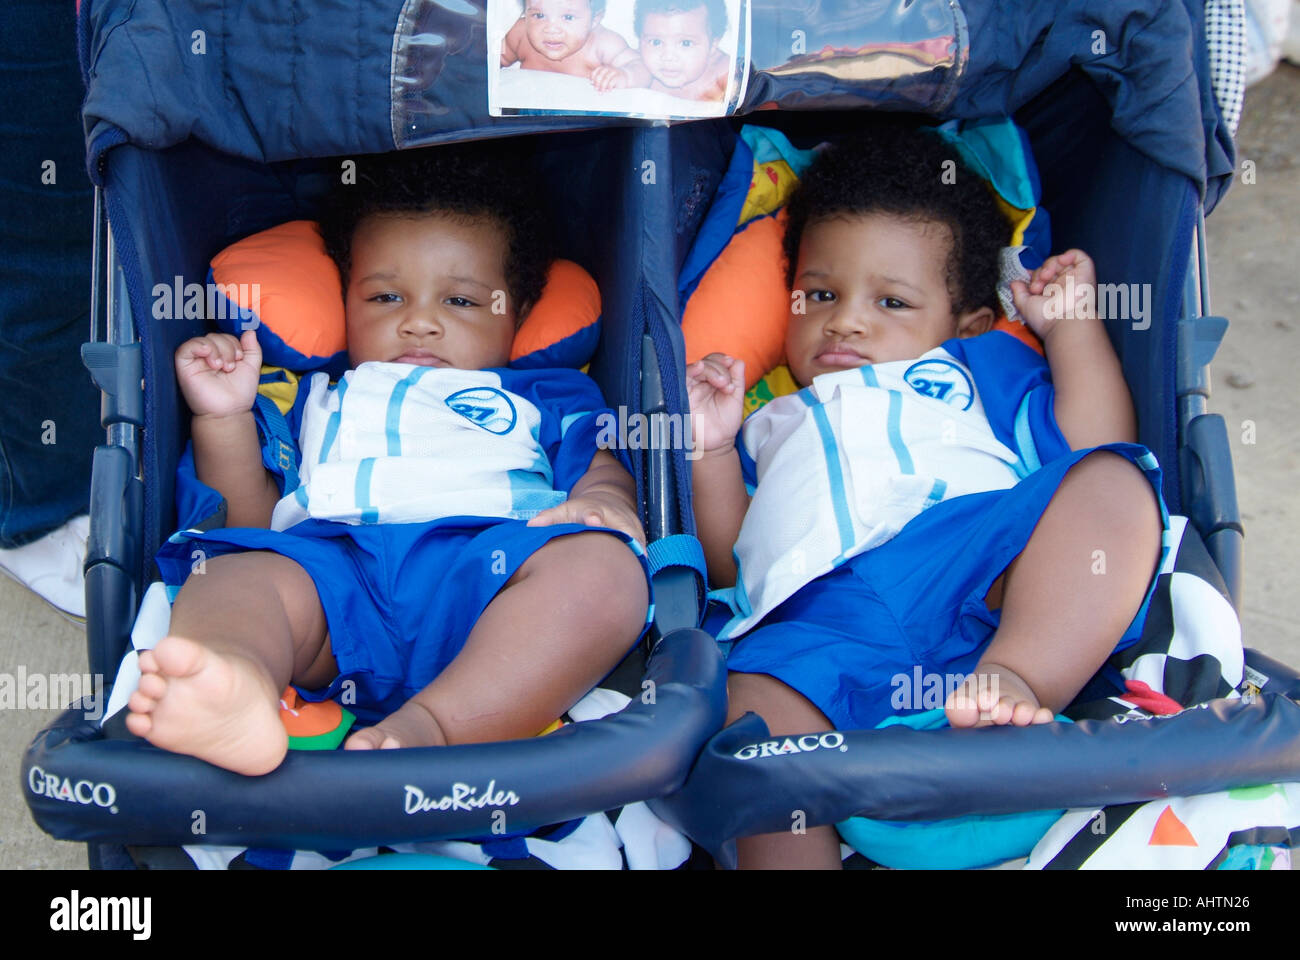 Identical Twins Boys Babies Stock Photos & Identical Twins Boys ...